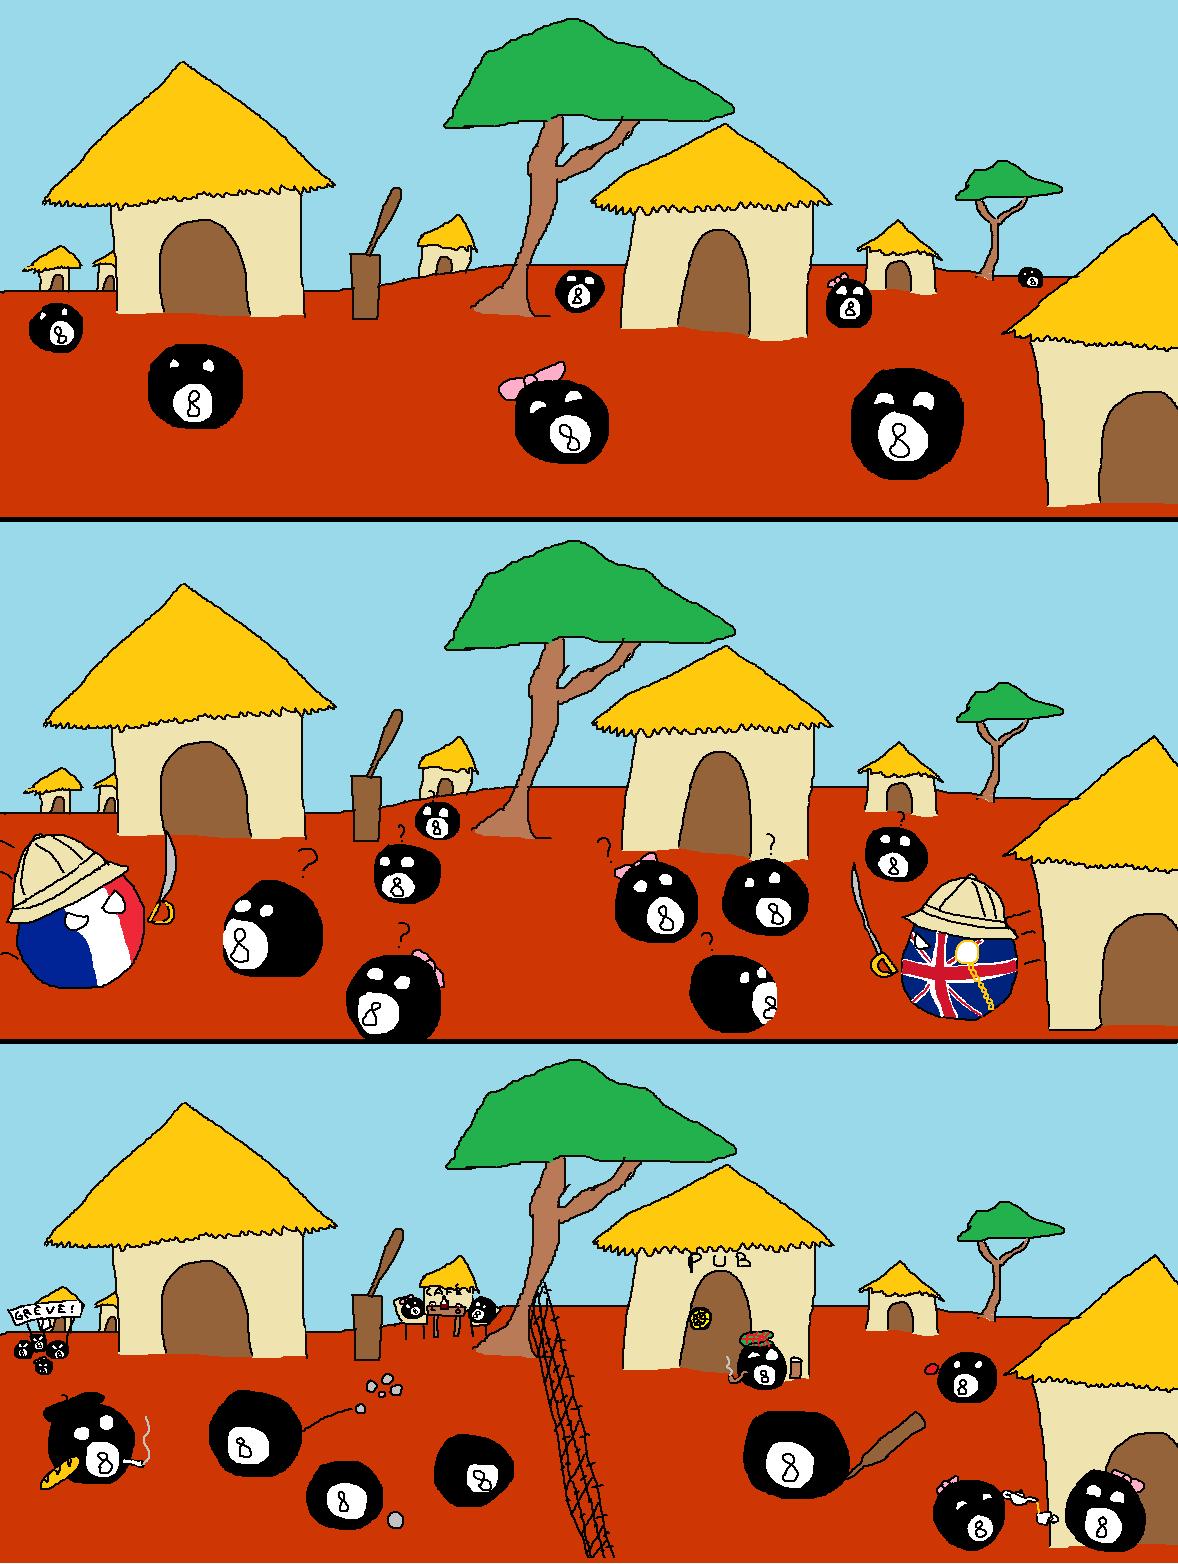 Plik:8ball - Colonización.png